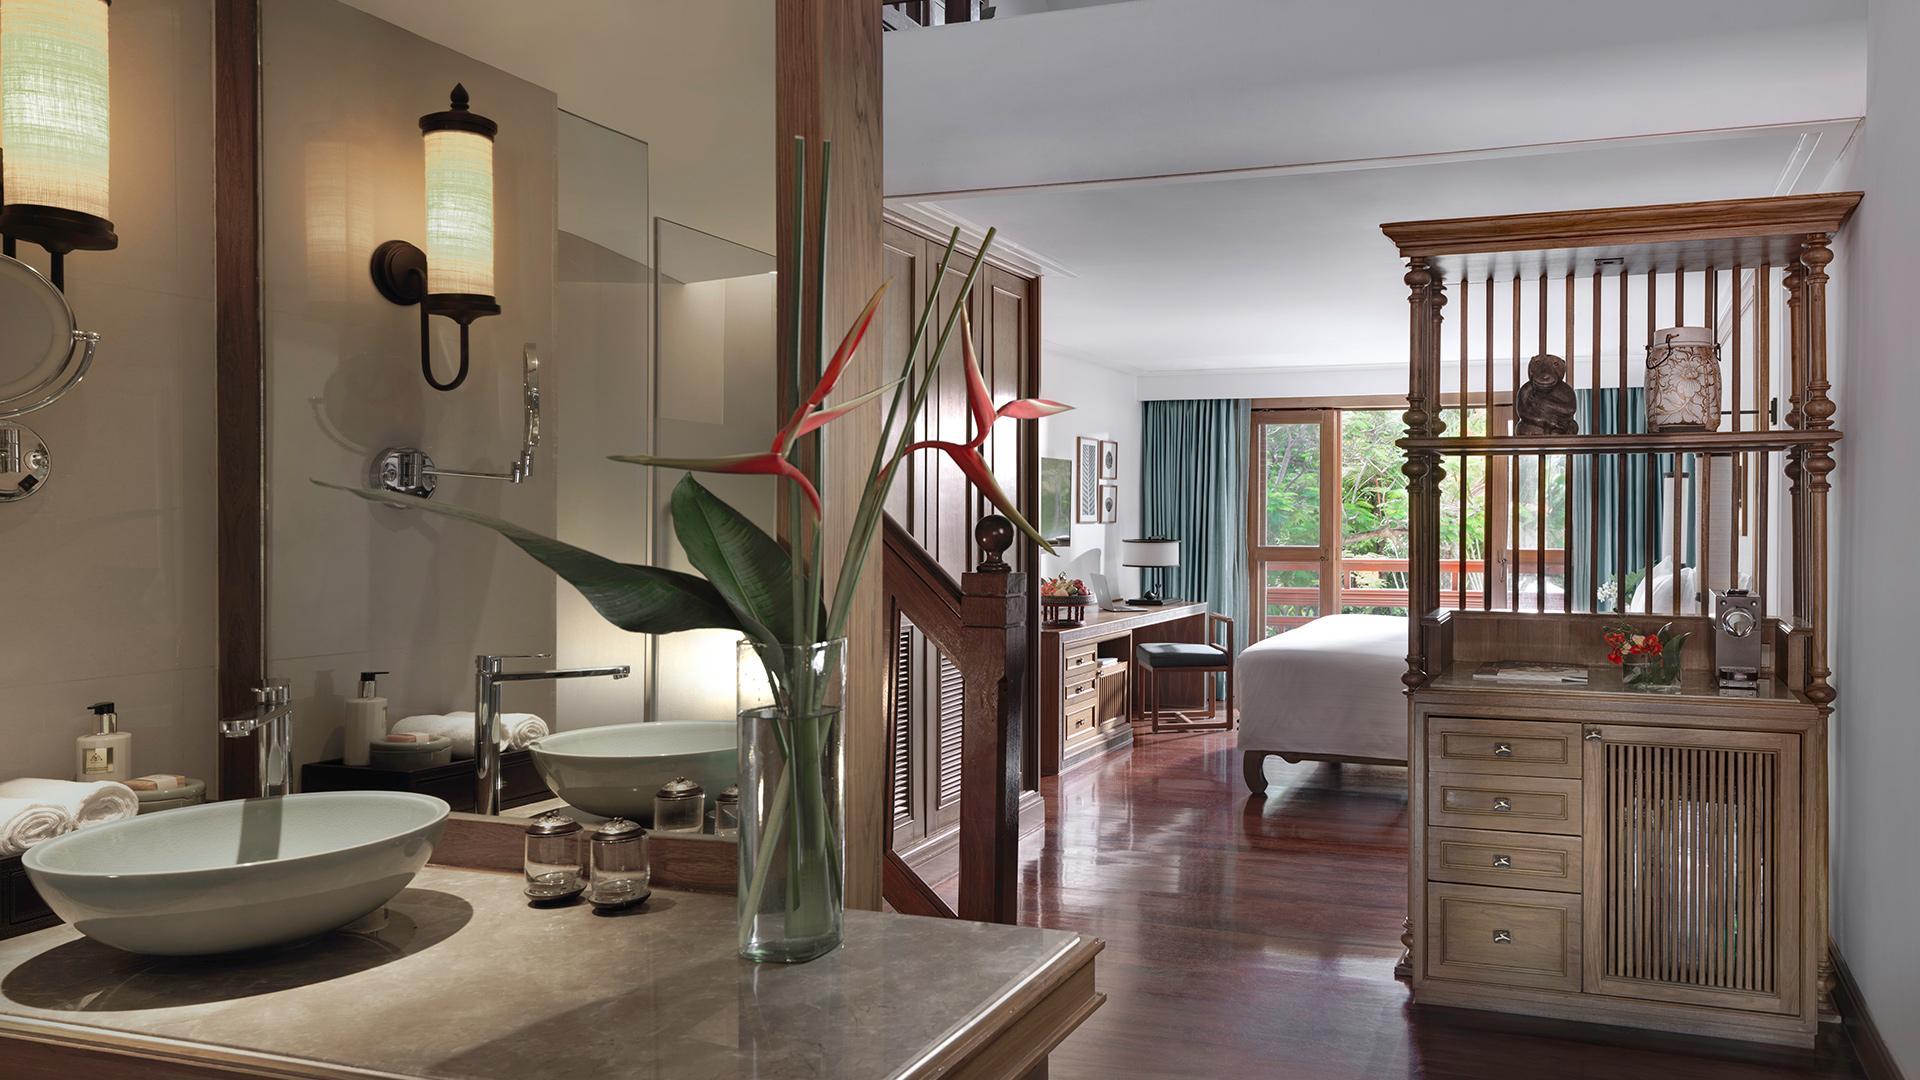 Duplex One-Bedroom Suite image 1 at Santiburi Koh Samui Jun 20 by Amphoe Ko Samui, Chang Wat Surat Thani, Thailand